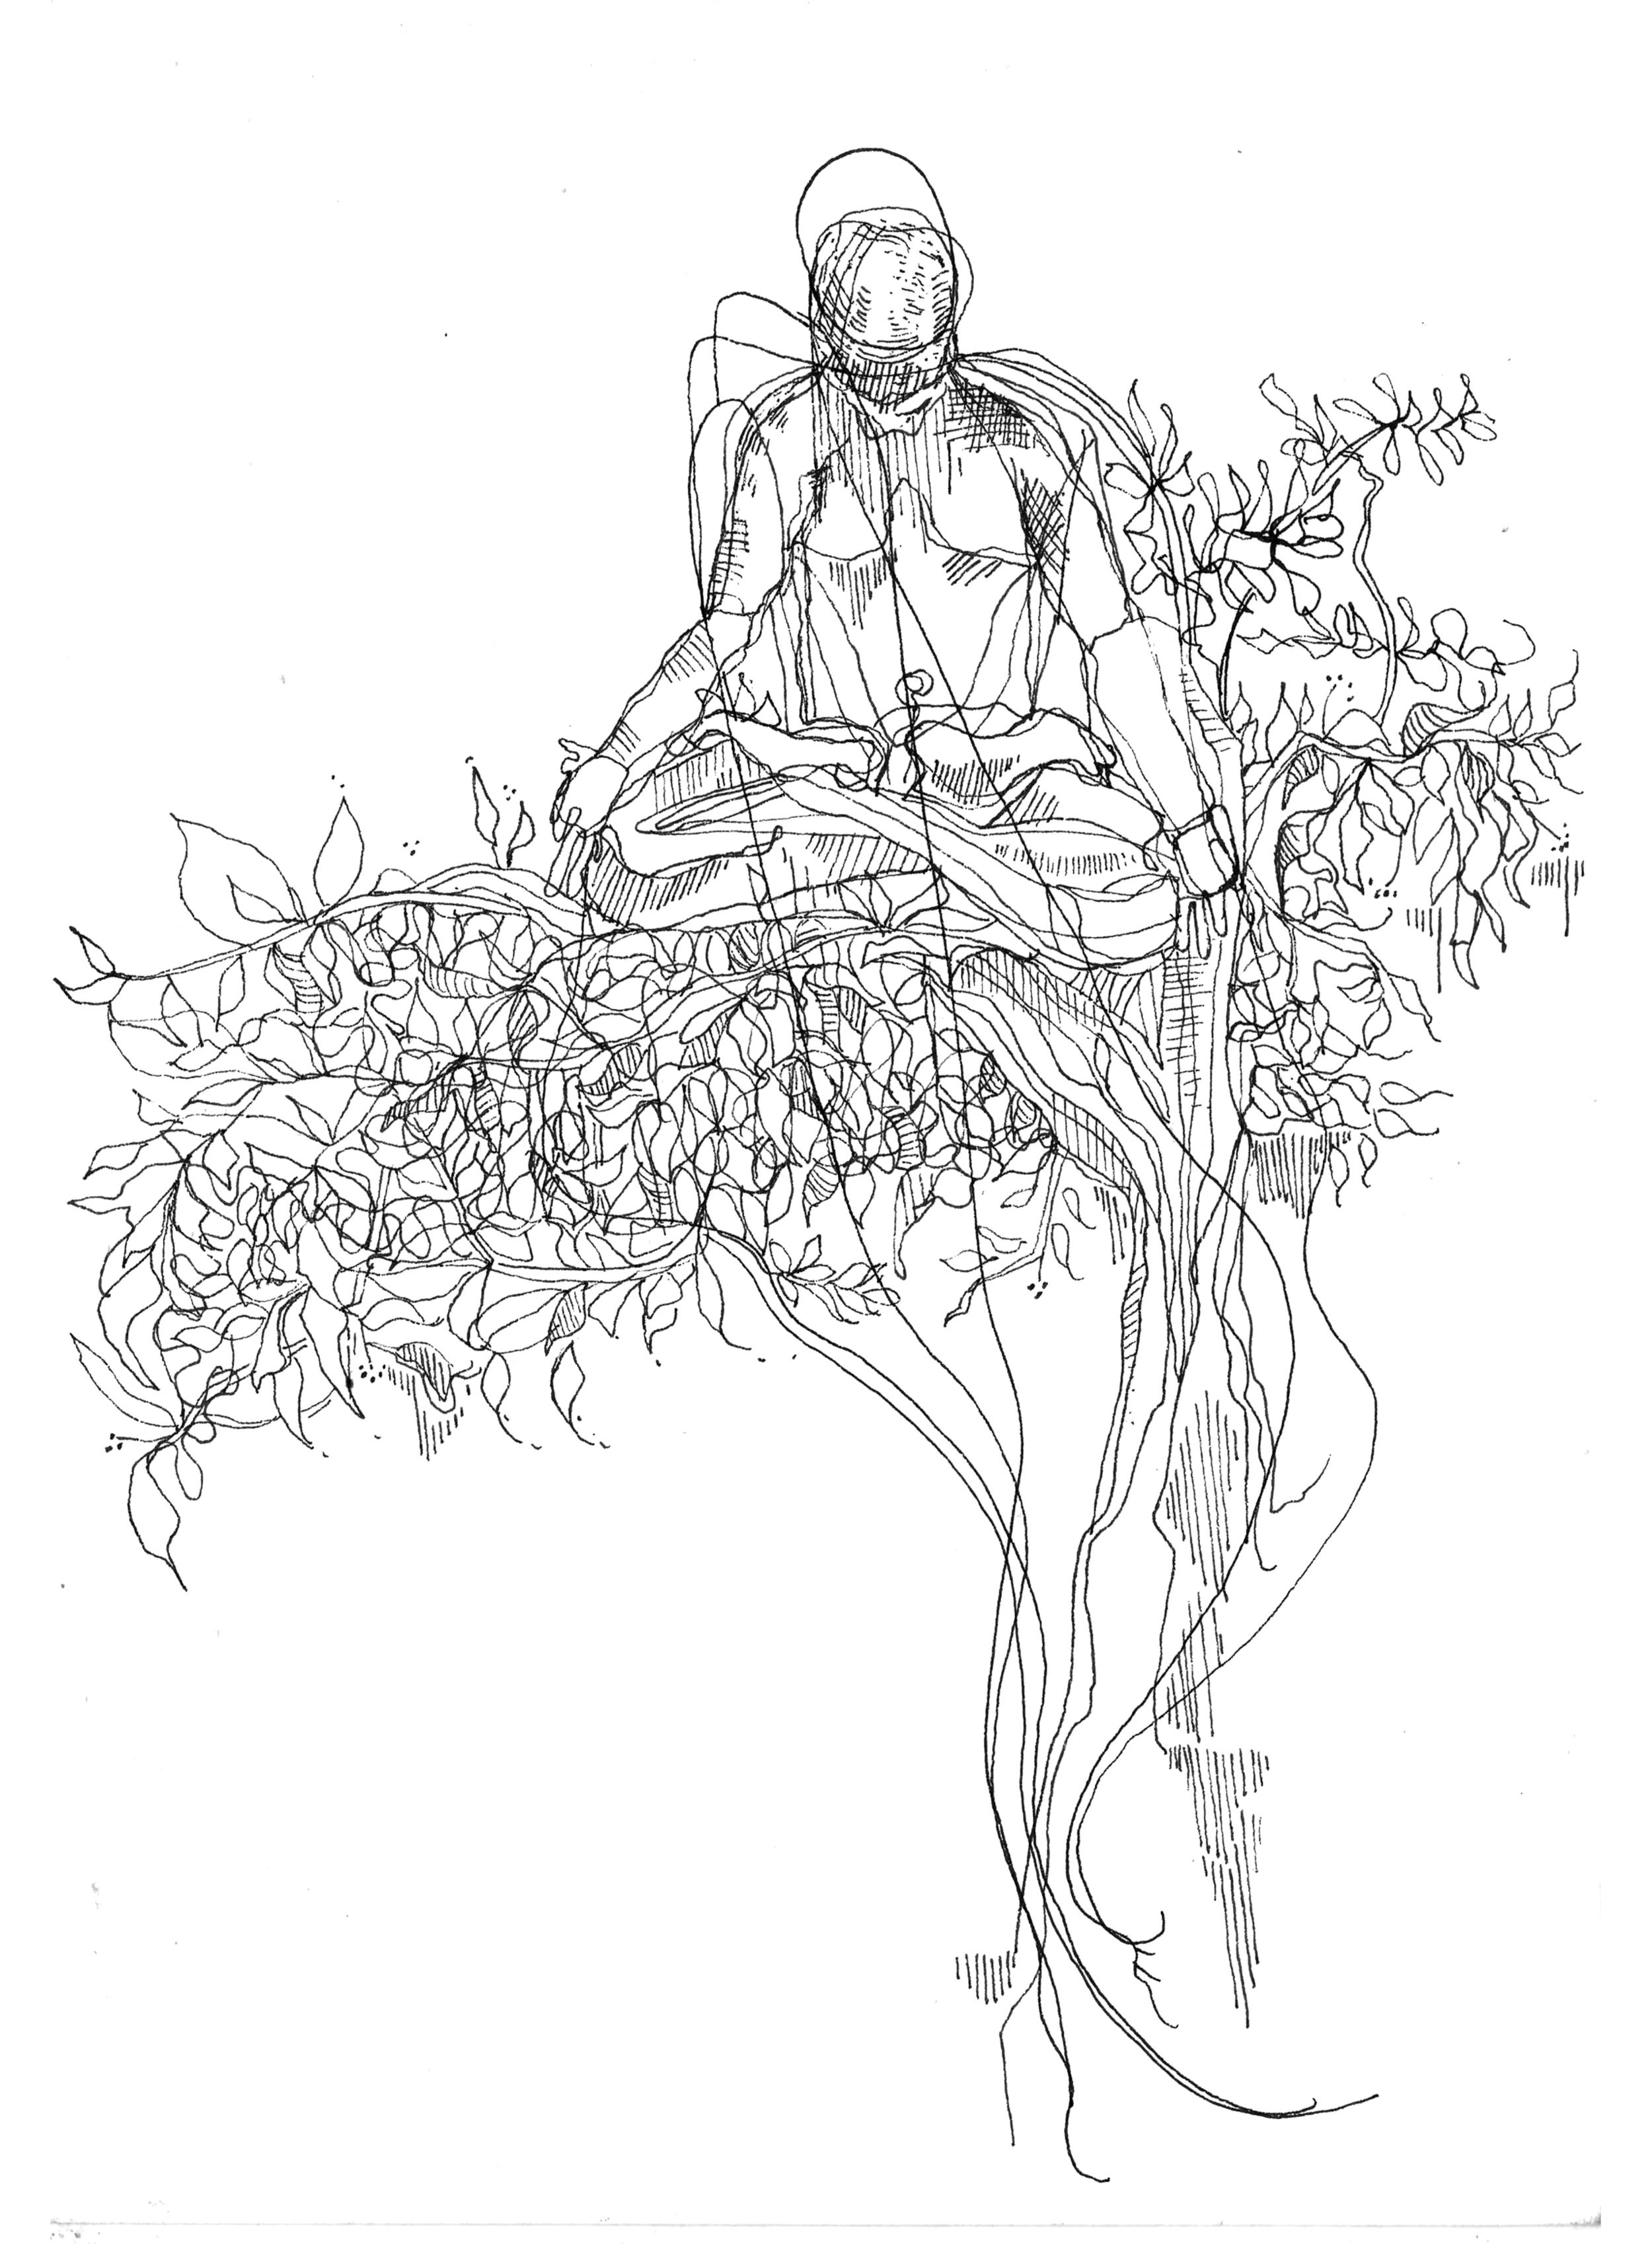 one yogi in a tree